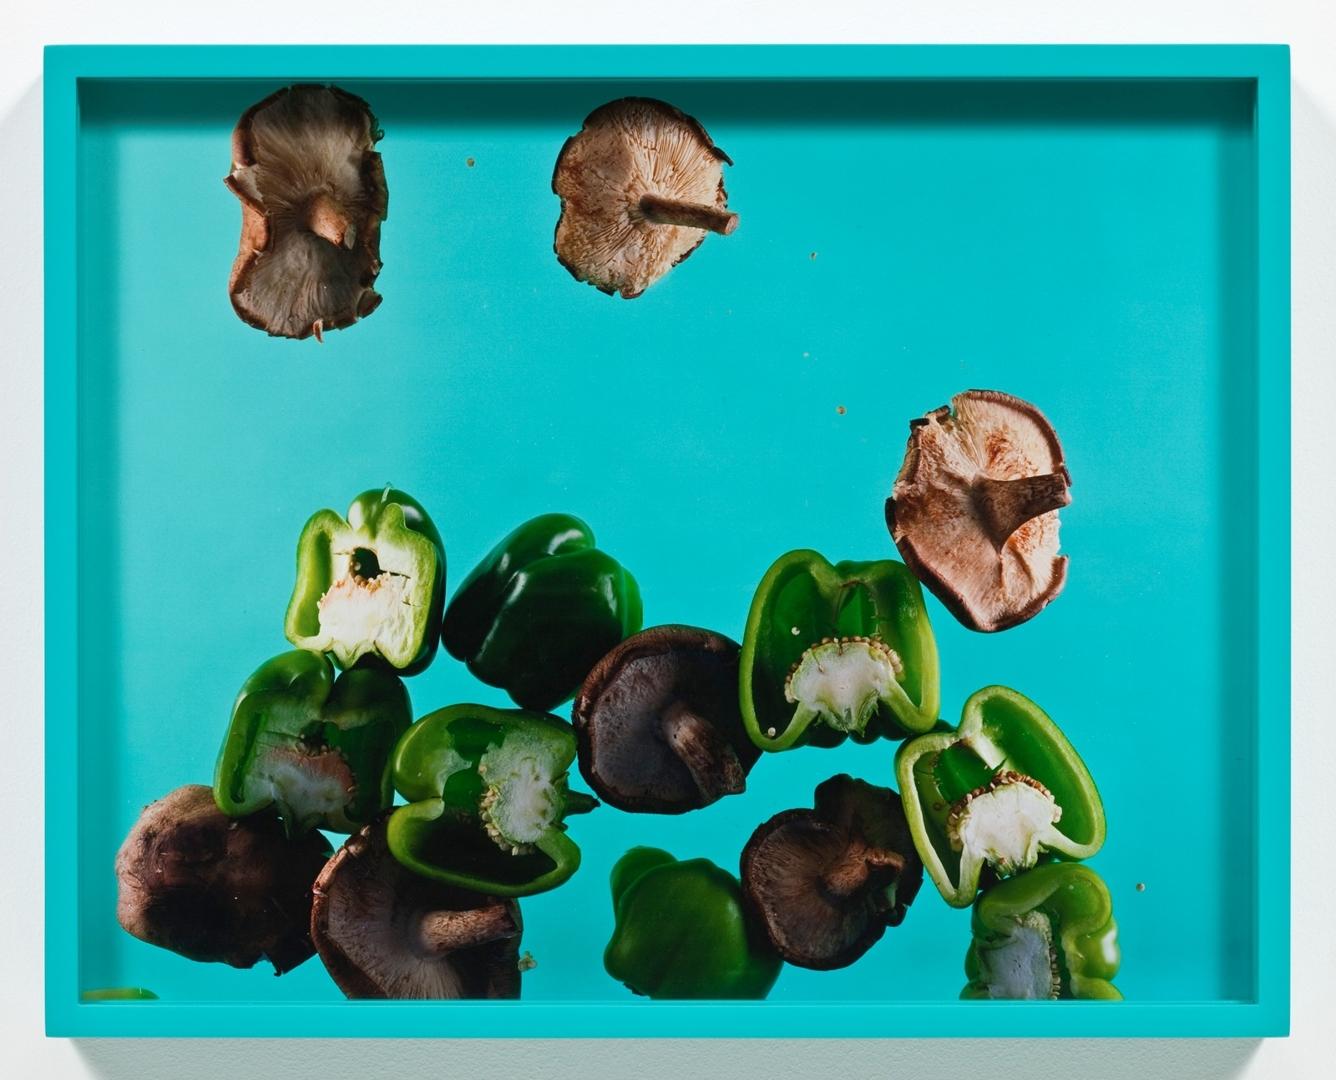 Green Peppers, Shiitake. 2009 image